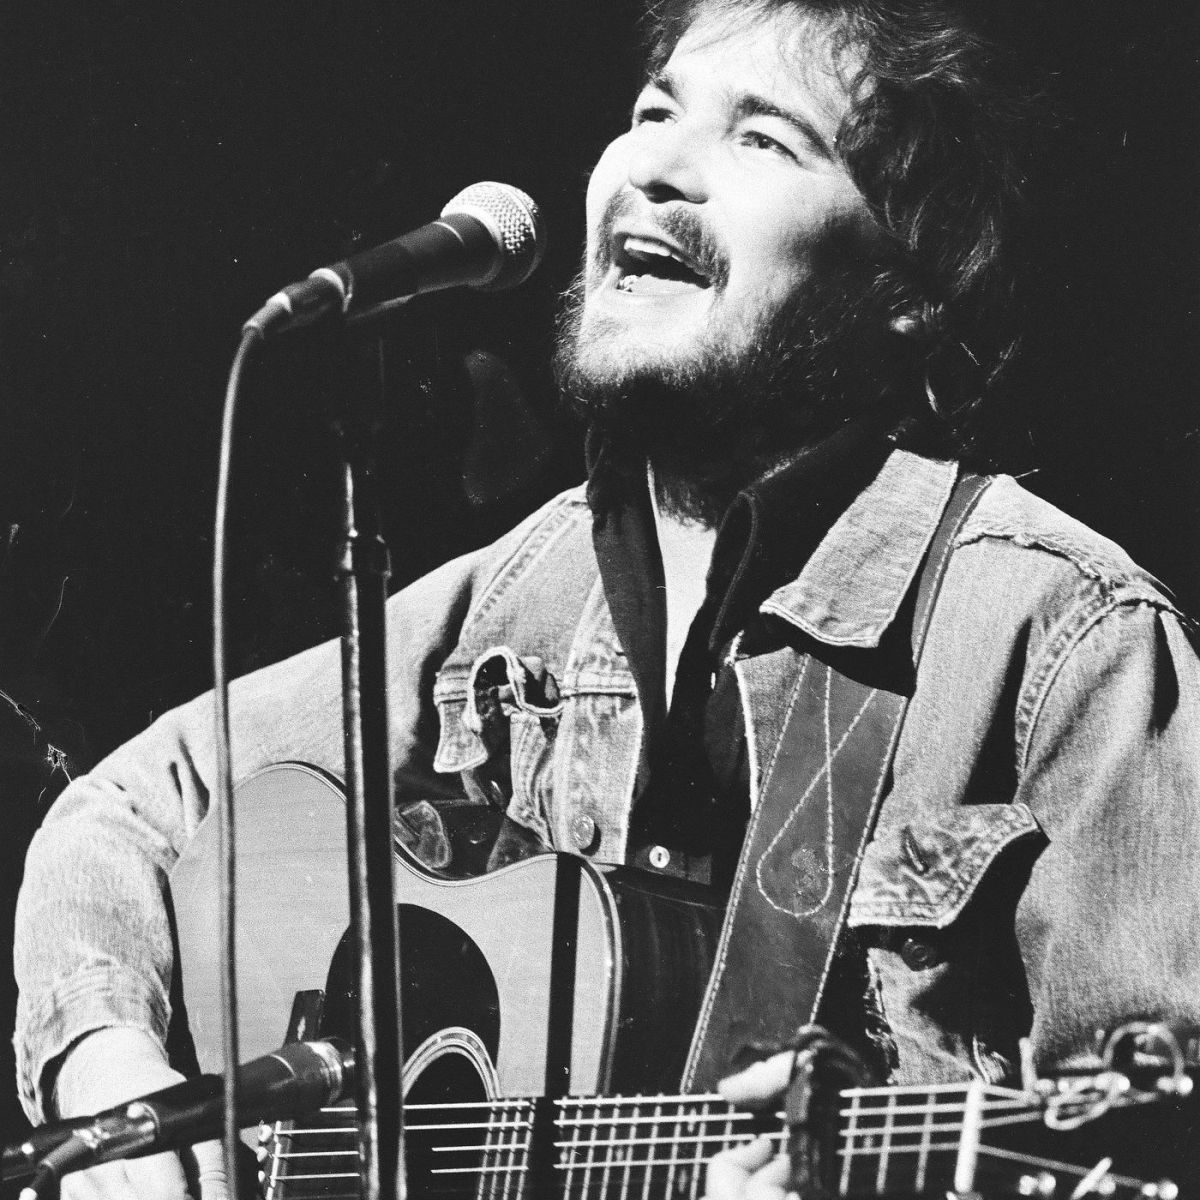 The young singing mailman John Prine